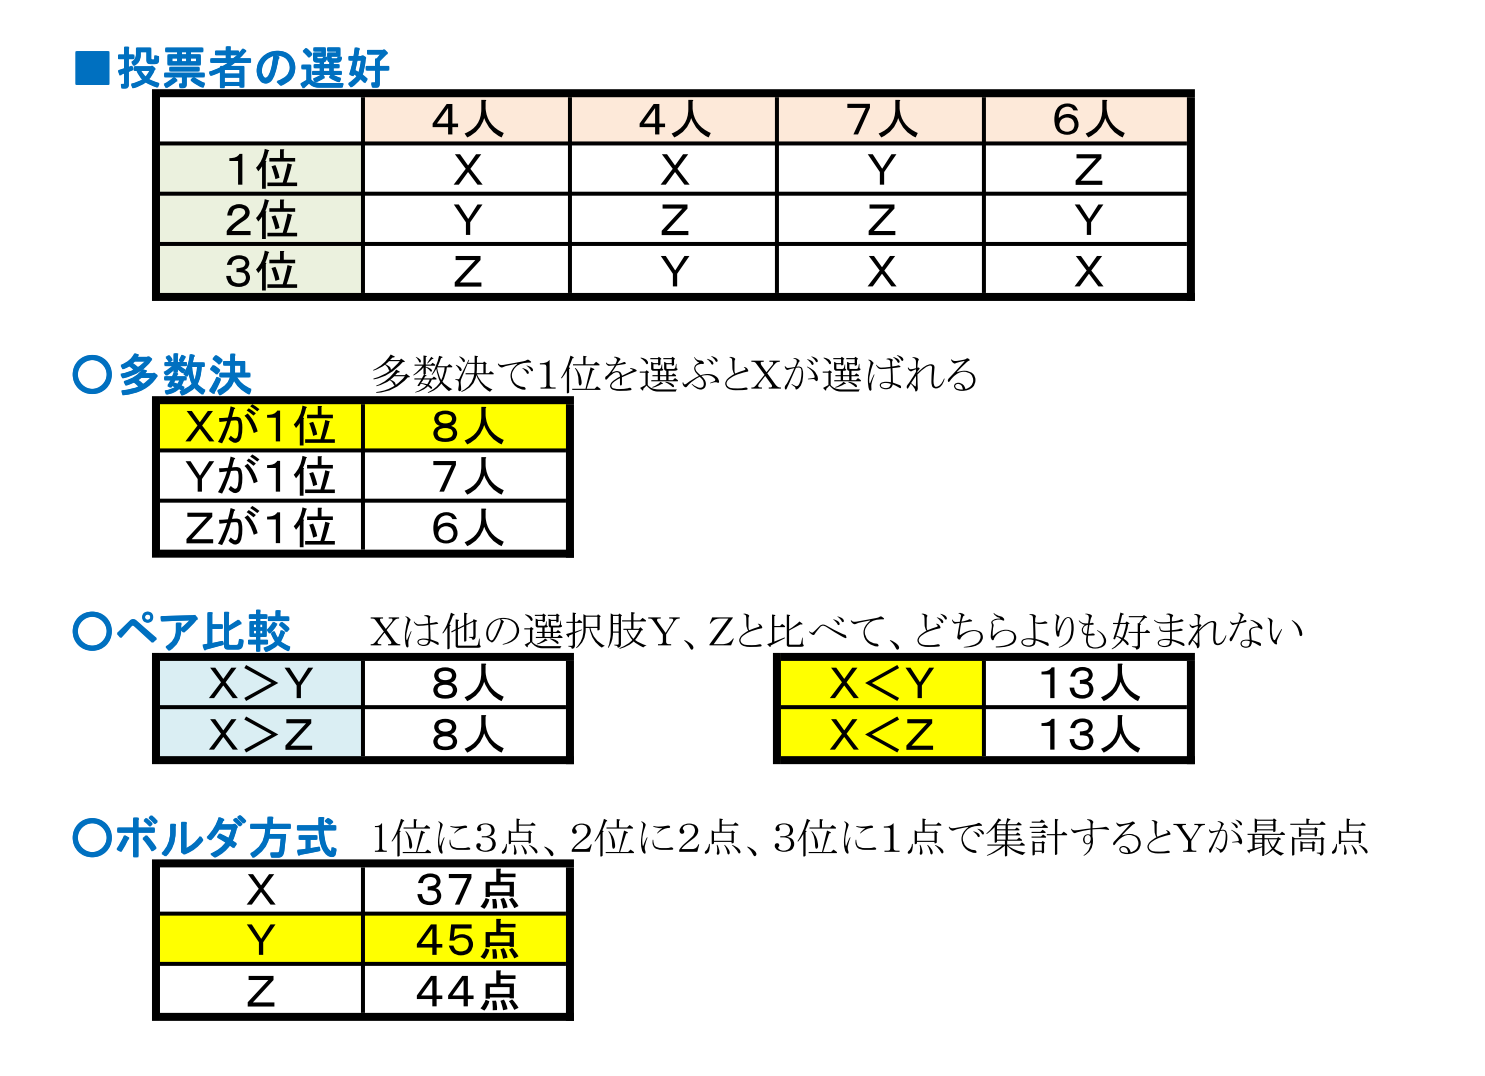 tasuketsu1-crop.png